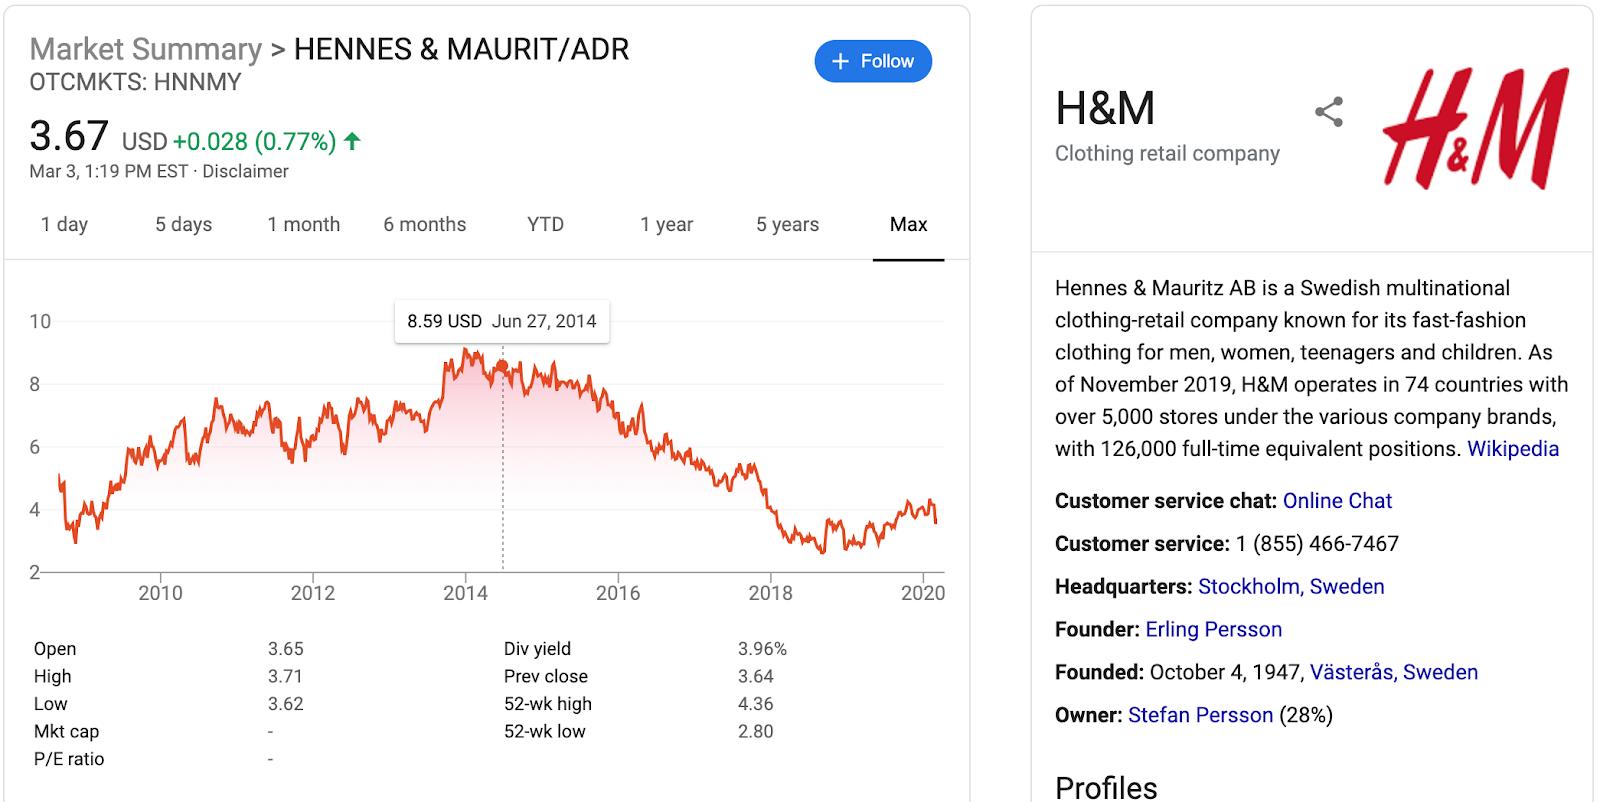 #FastFashion H&M Brand Image & Stock Price